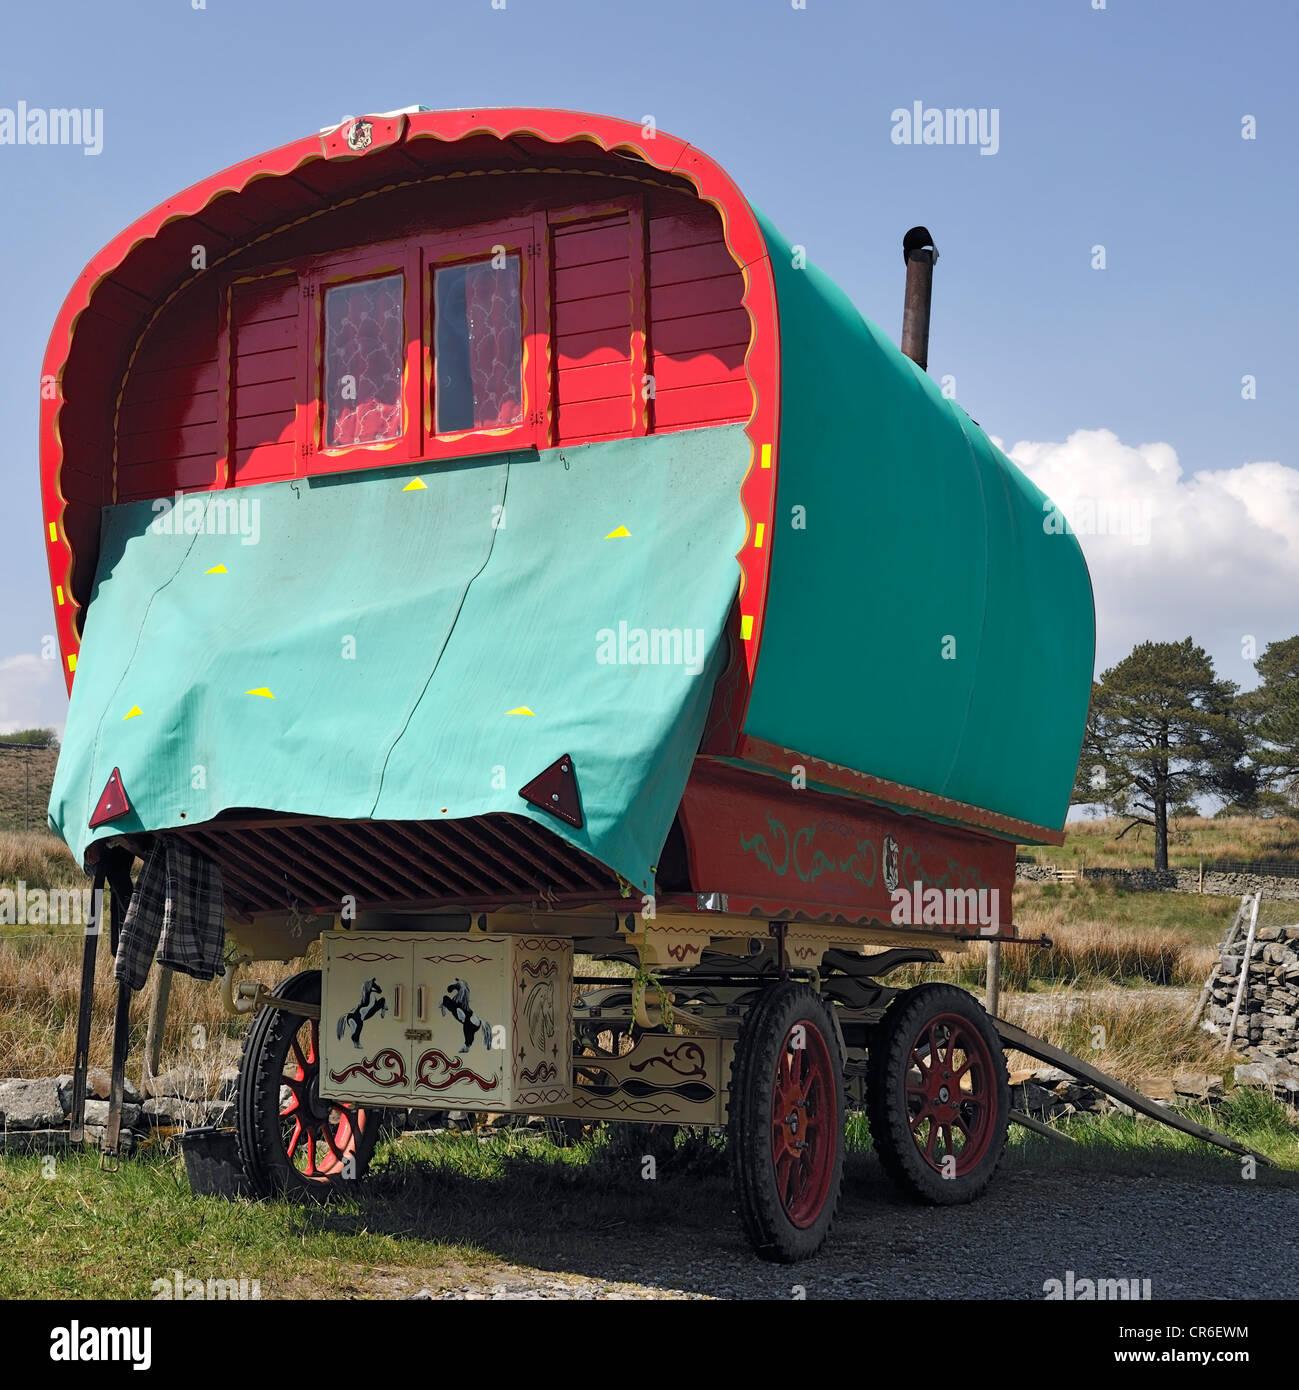 A traditional horse-drawn gypsy caravan, Garsdale Head, Yorkshire, England - Stock Image